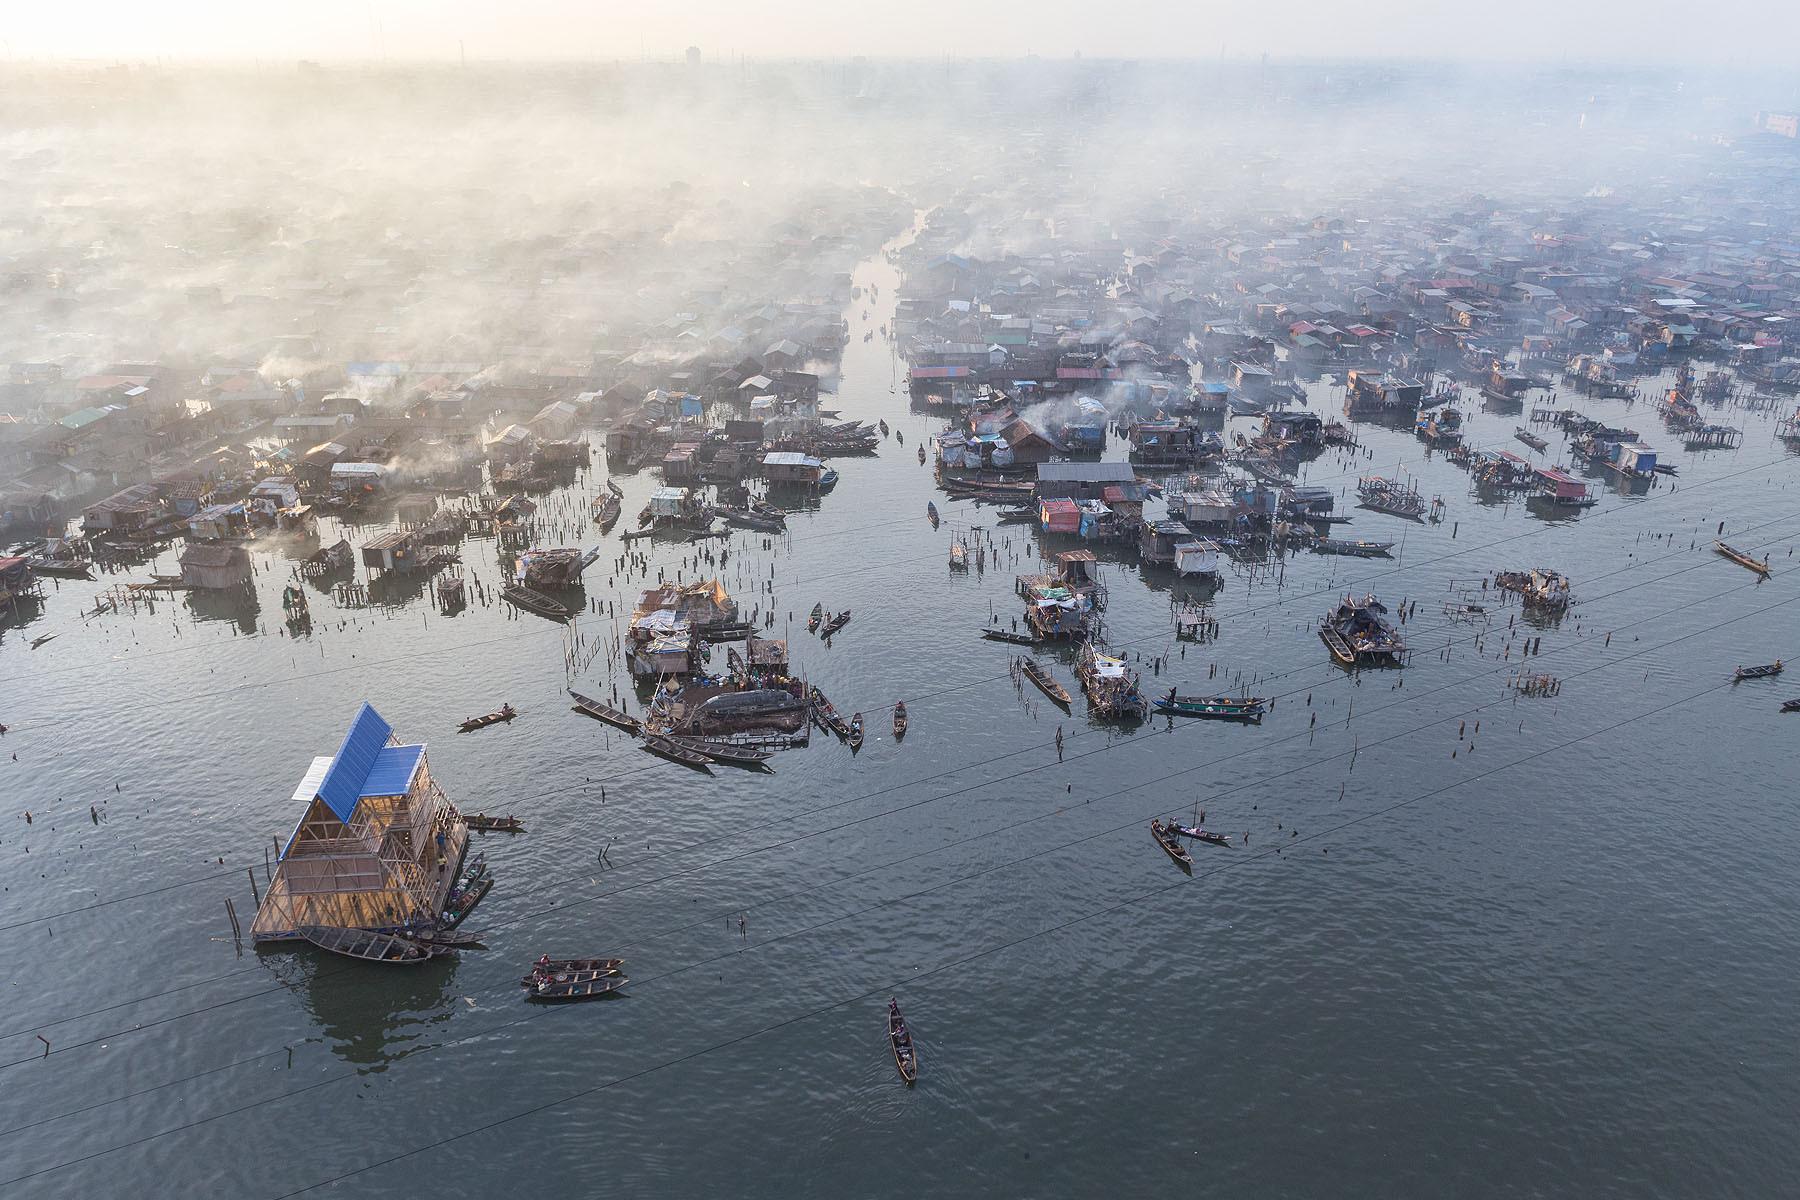 Iwan Baan to Judge Avant Guardian Photography Contest , Makoko, Lagos, Nigeria (Featured: Makoko Floating School by NLE Architects). Image © Iwan Baan